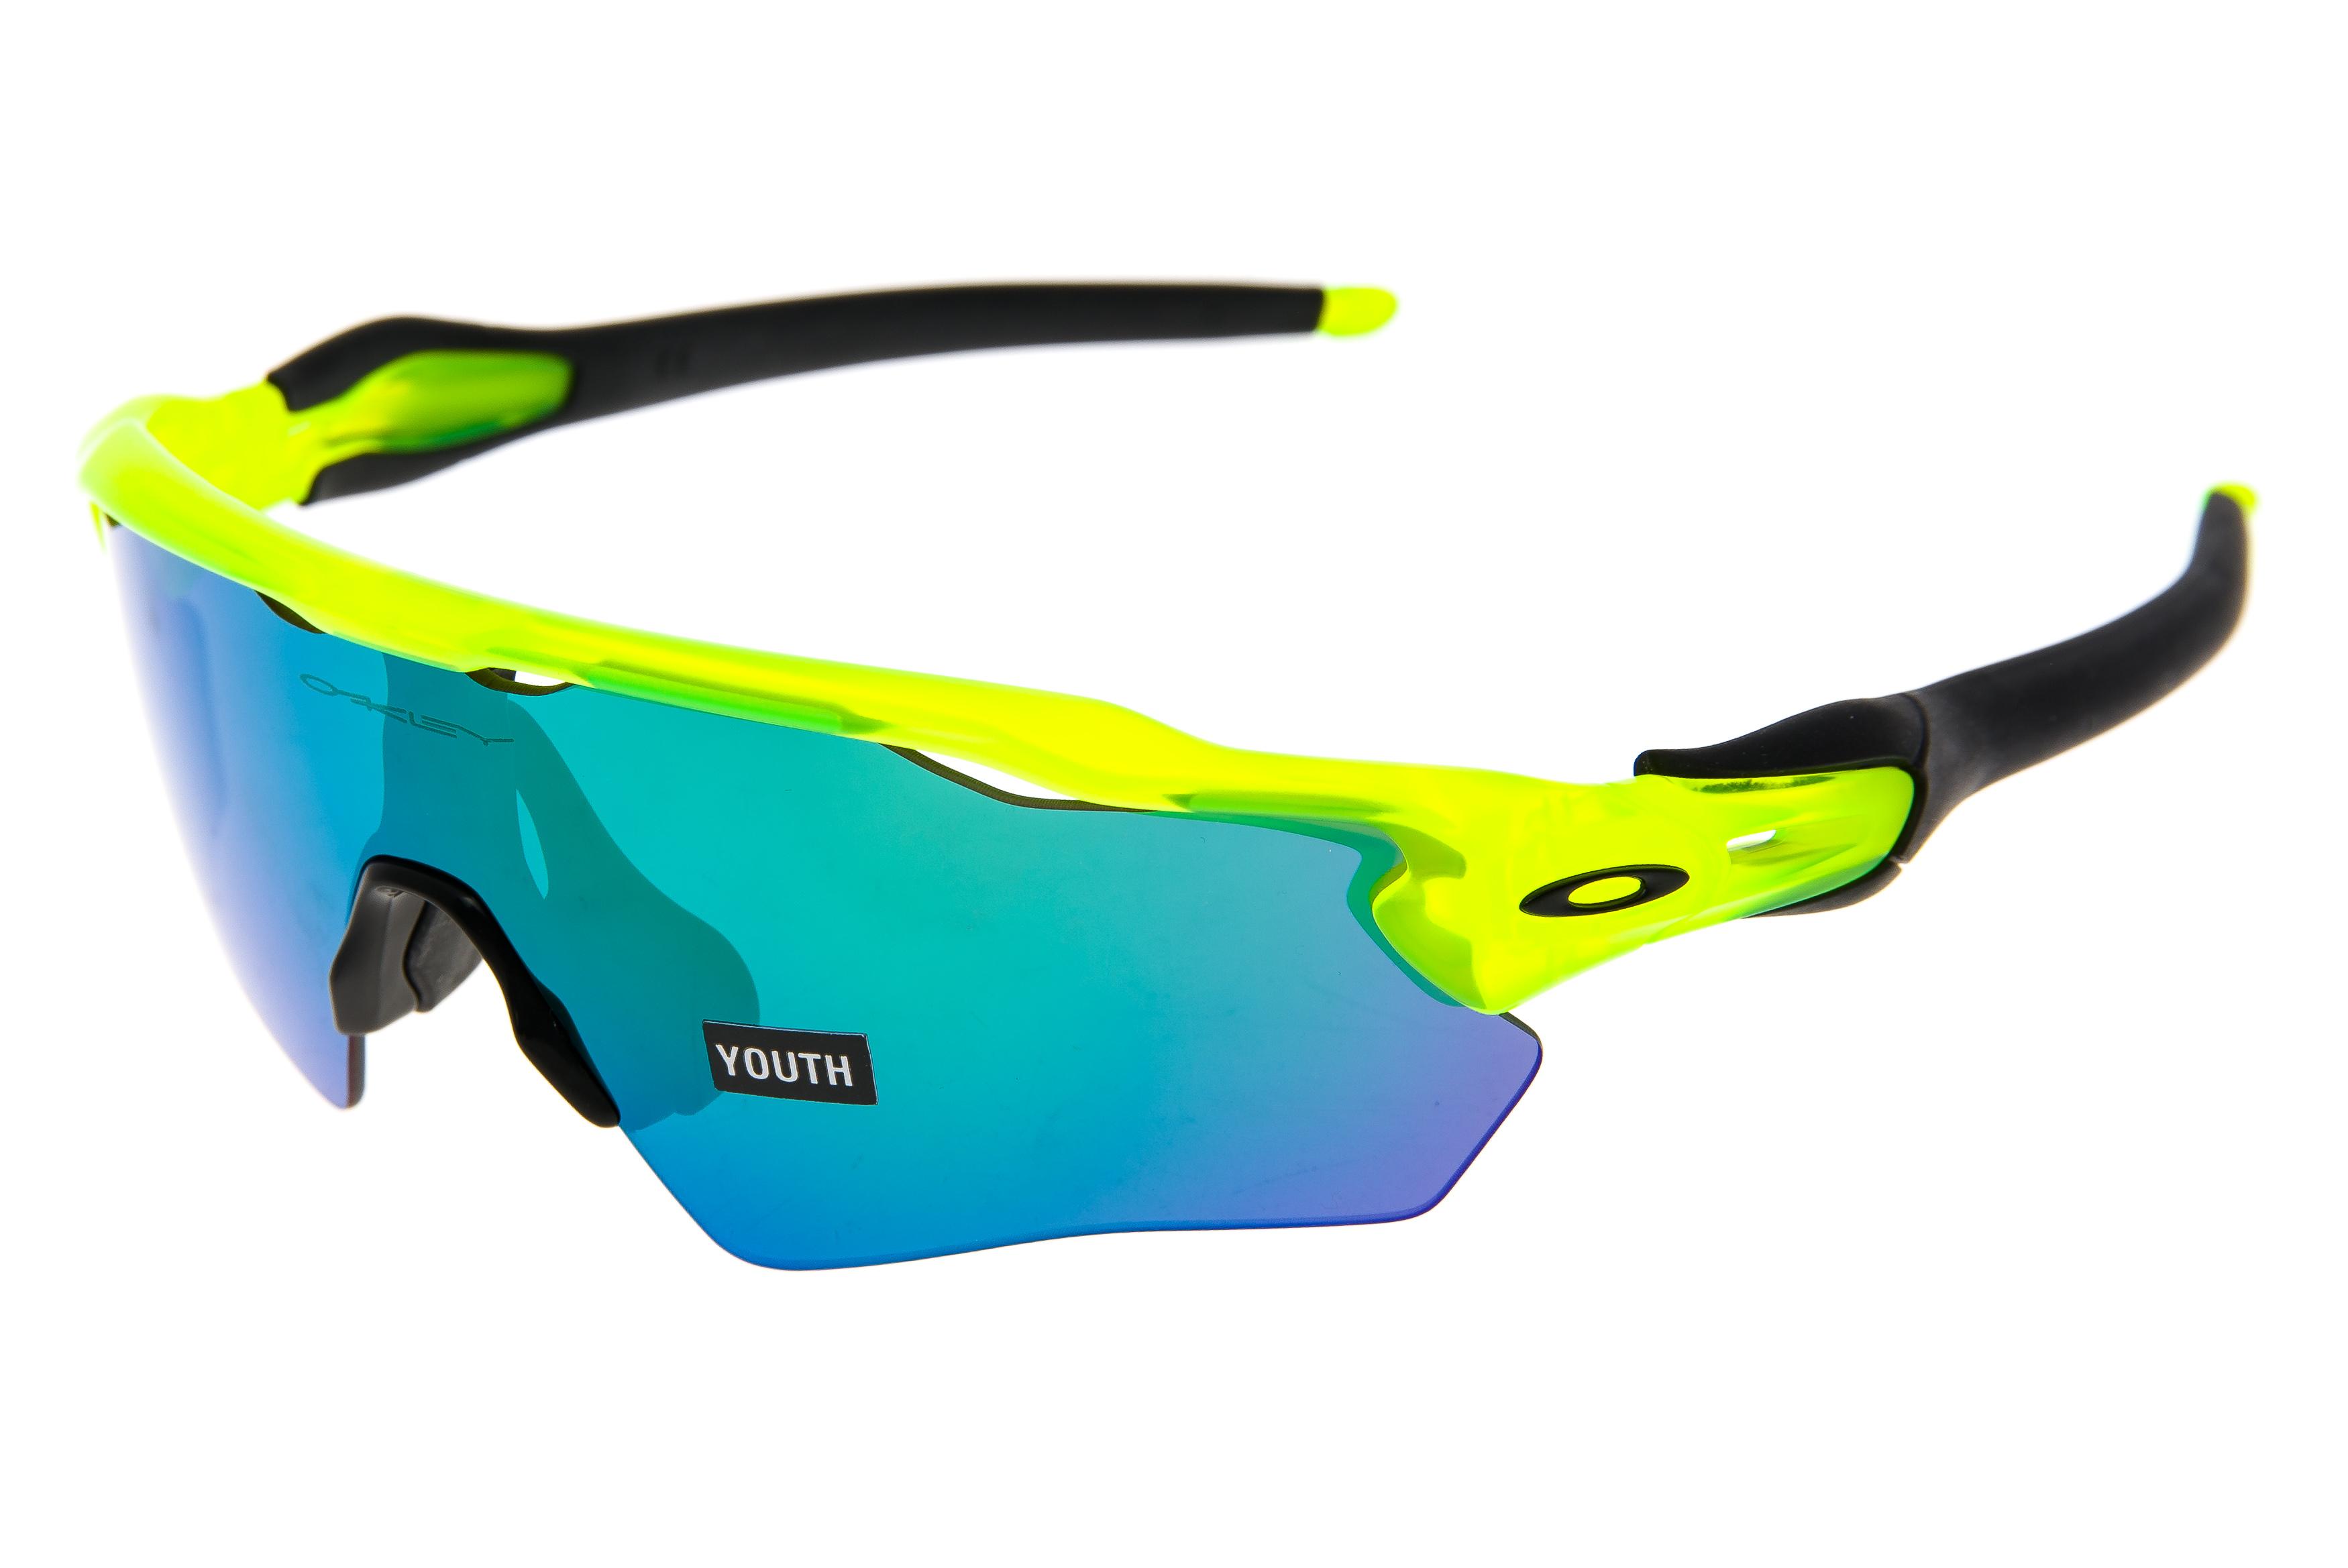 062c93161cb7c Details about Oakley Radar EV Path XS Youth Sunglasses Uranium Frame  Iridium Lens - Excellent